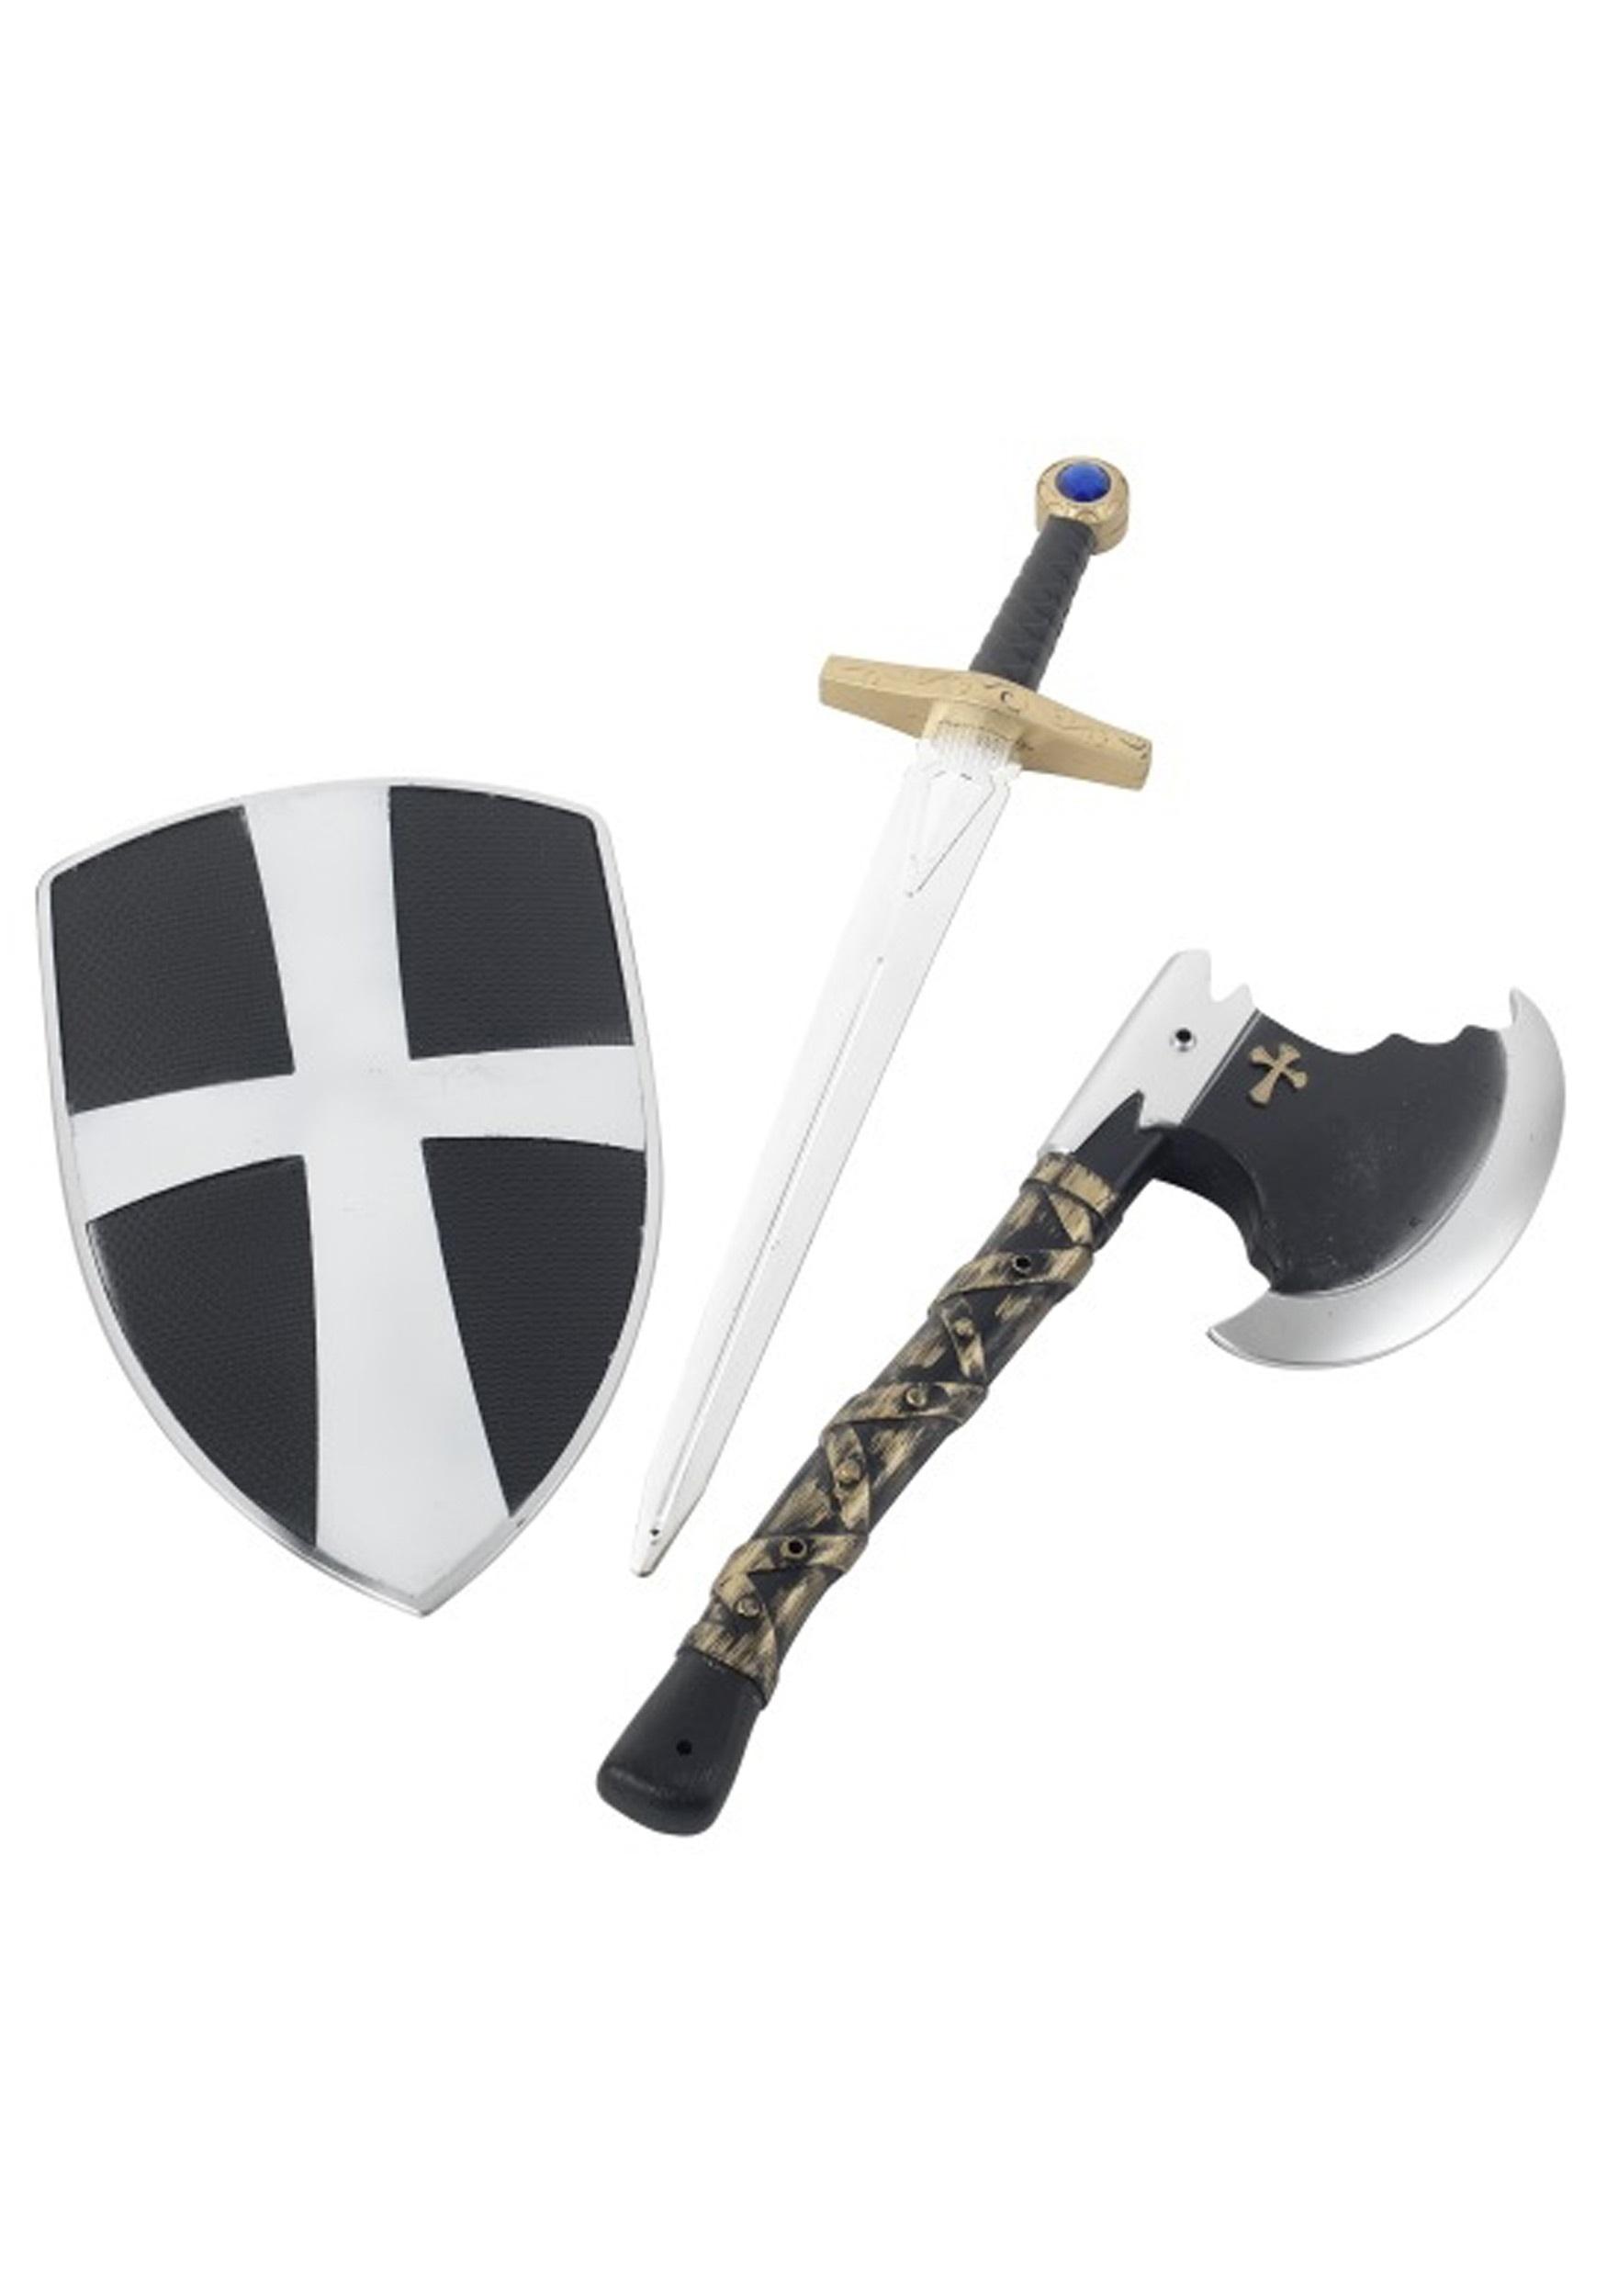 3 Piece Crusader Prop Weapon Set